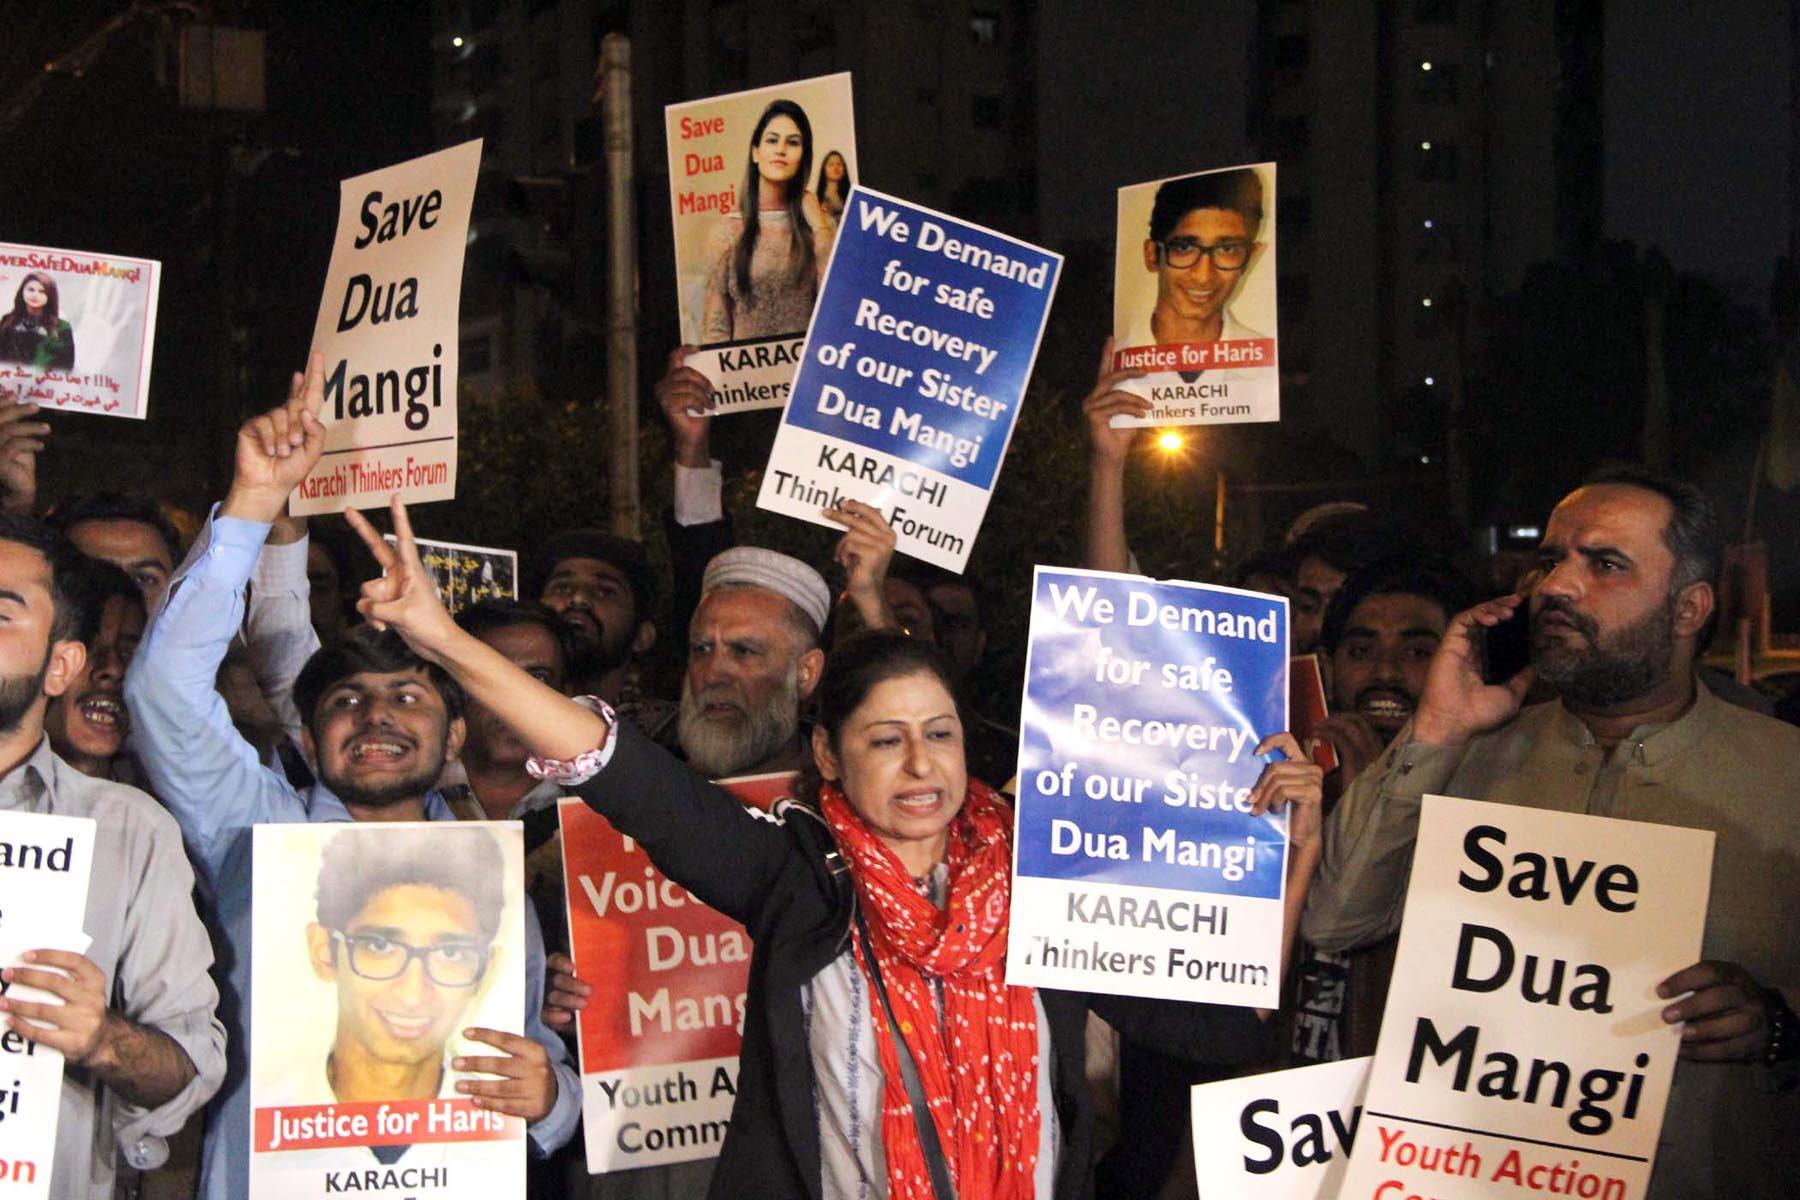 dua mangi s abduction releases social media vitriol against her